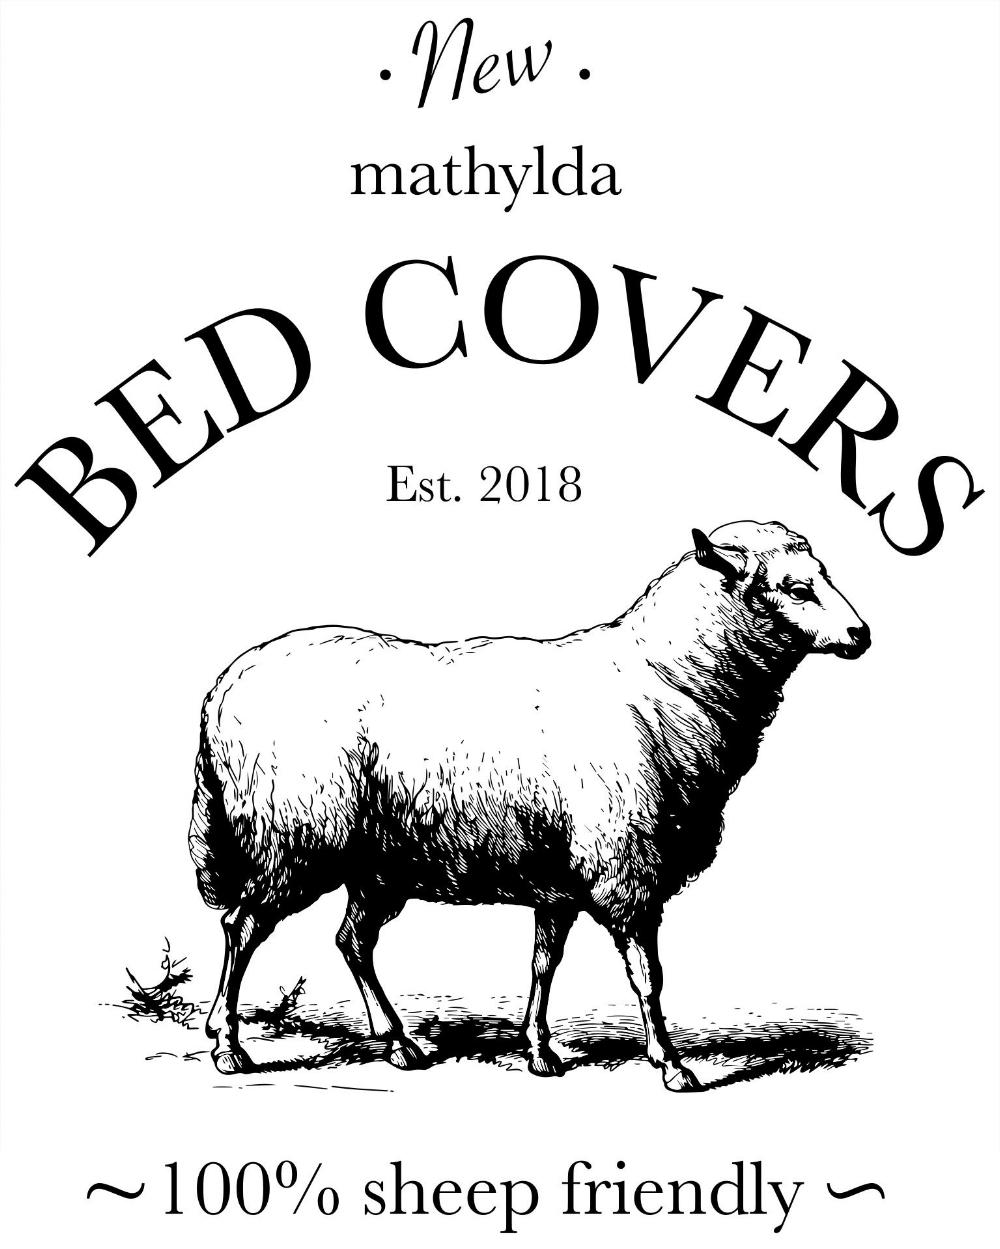 Sheep_bedcovers_small.jpg